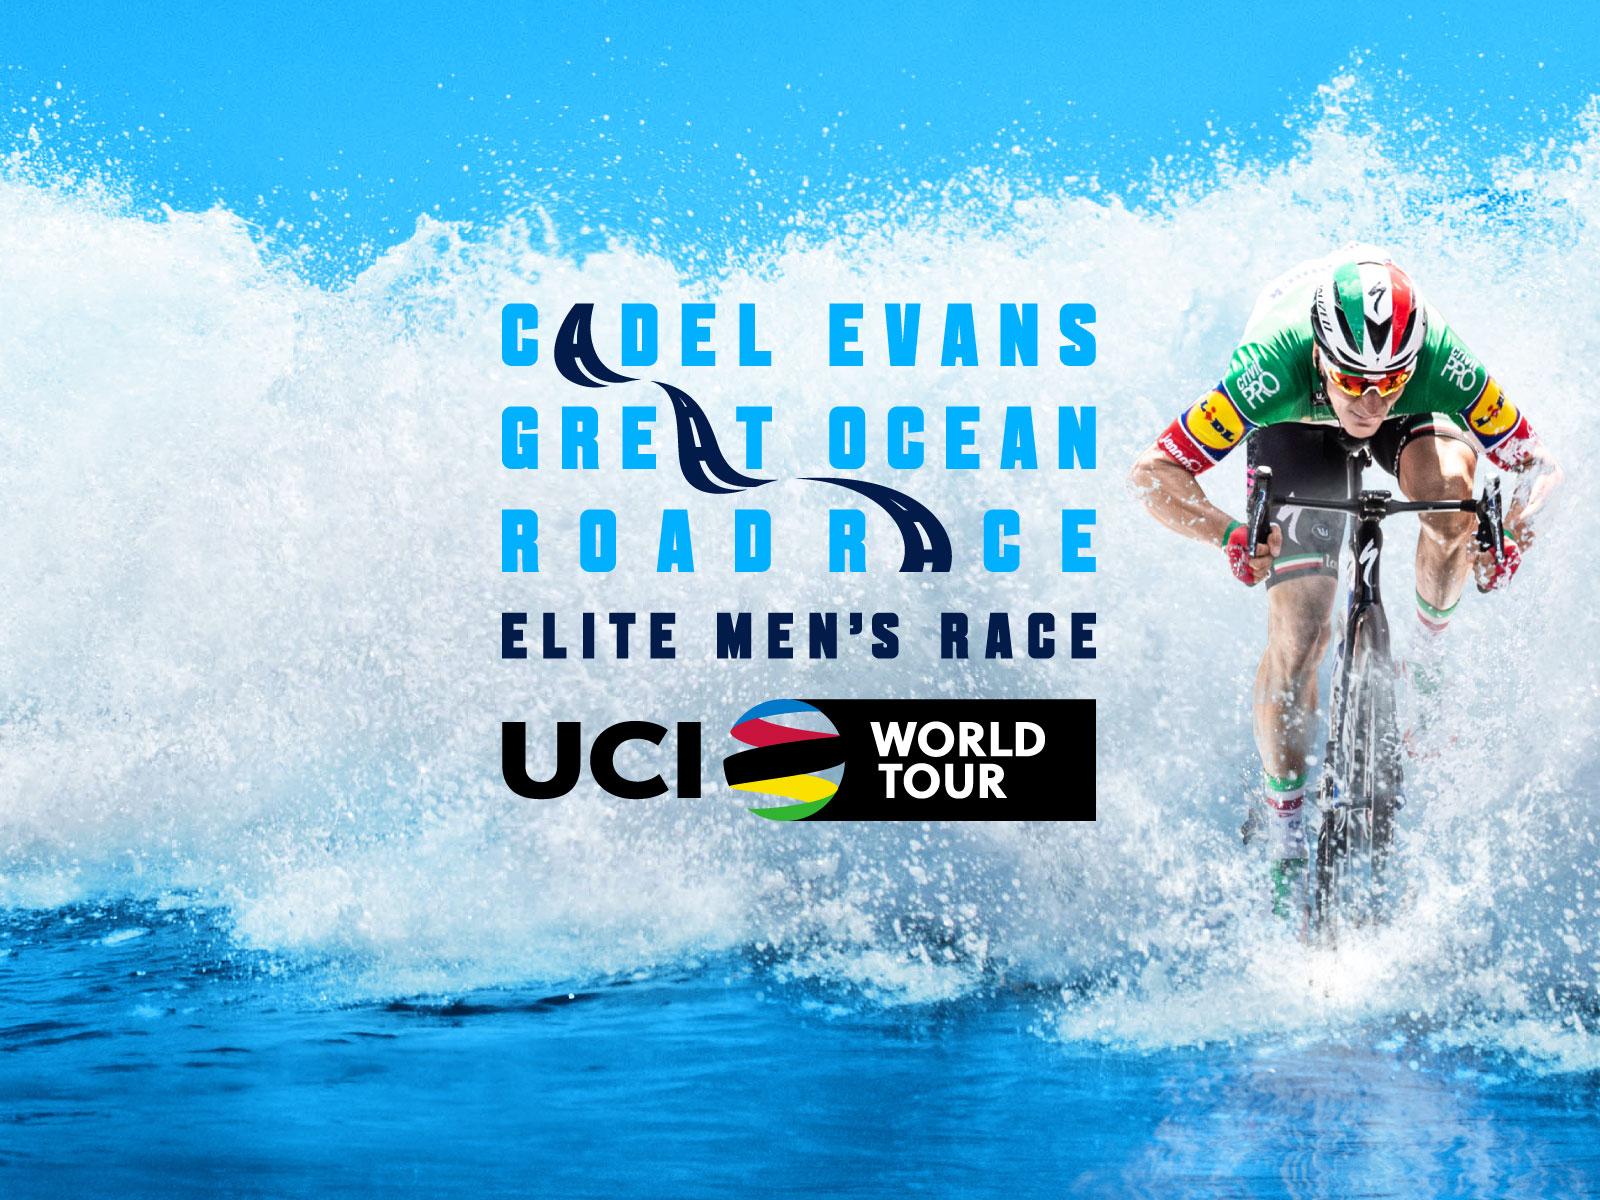 Home - Cadel Evans Great Ocean Road Race